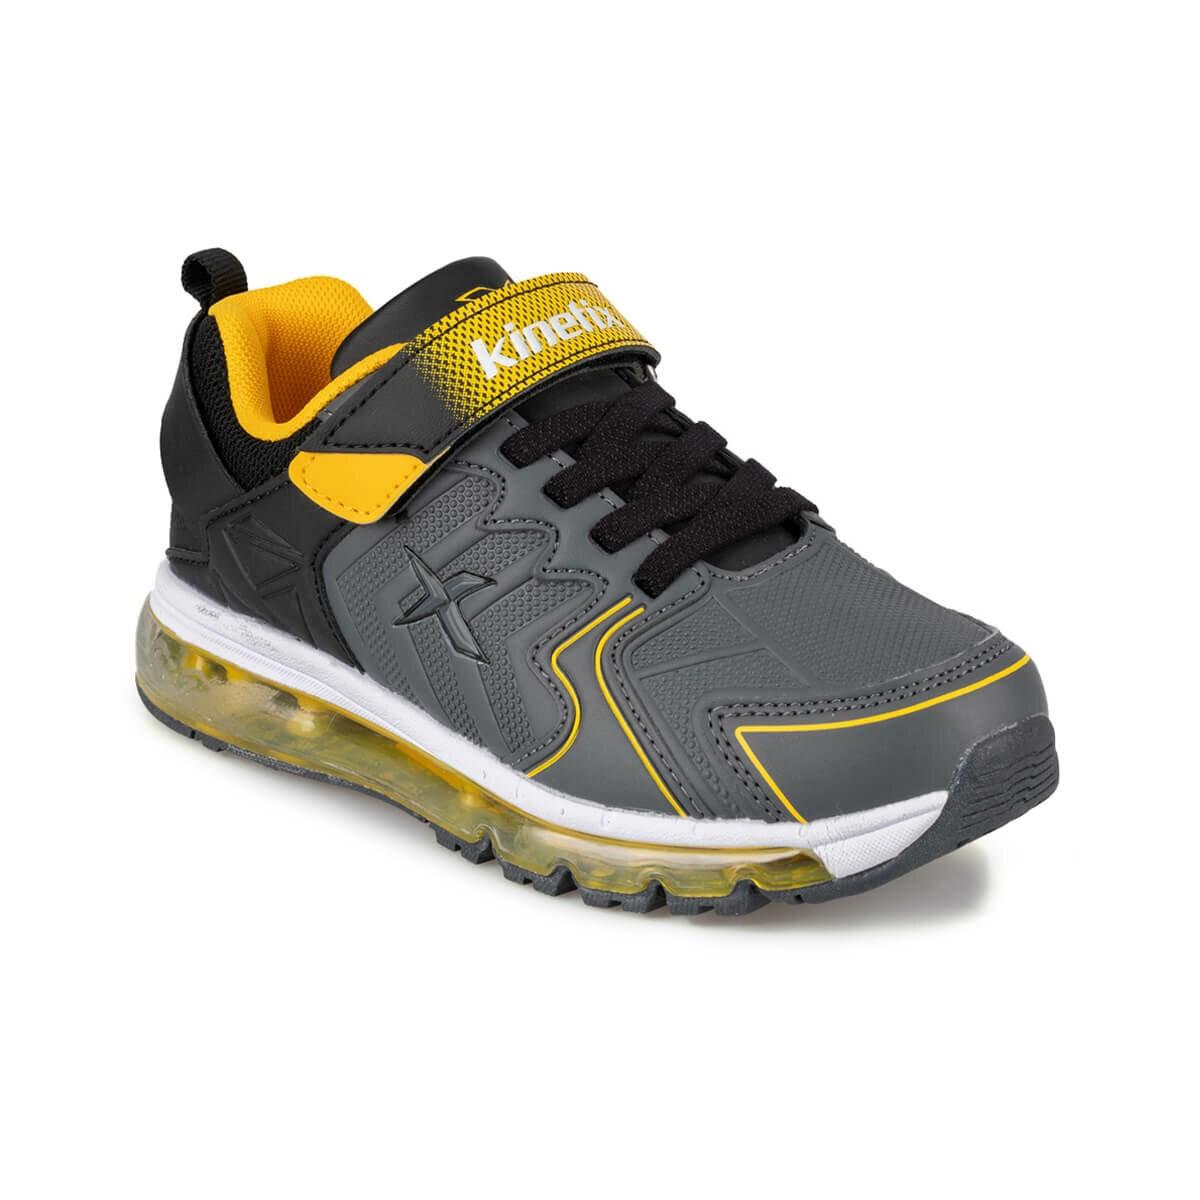 FLO AFLON 9PR Gray Male Child Running Shoes KINETIX